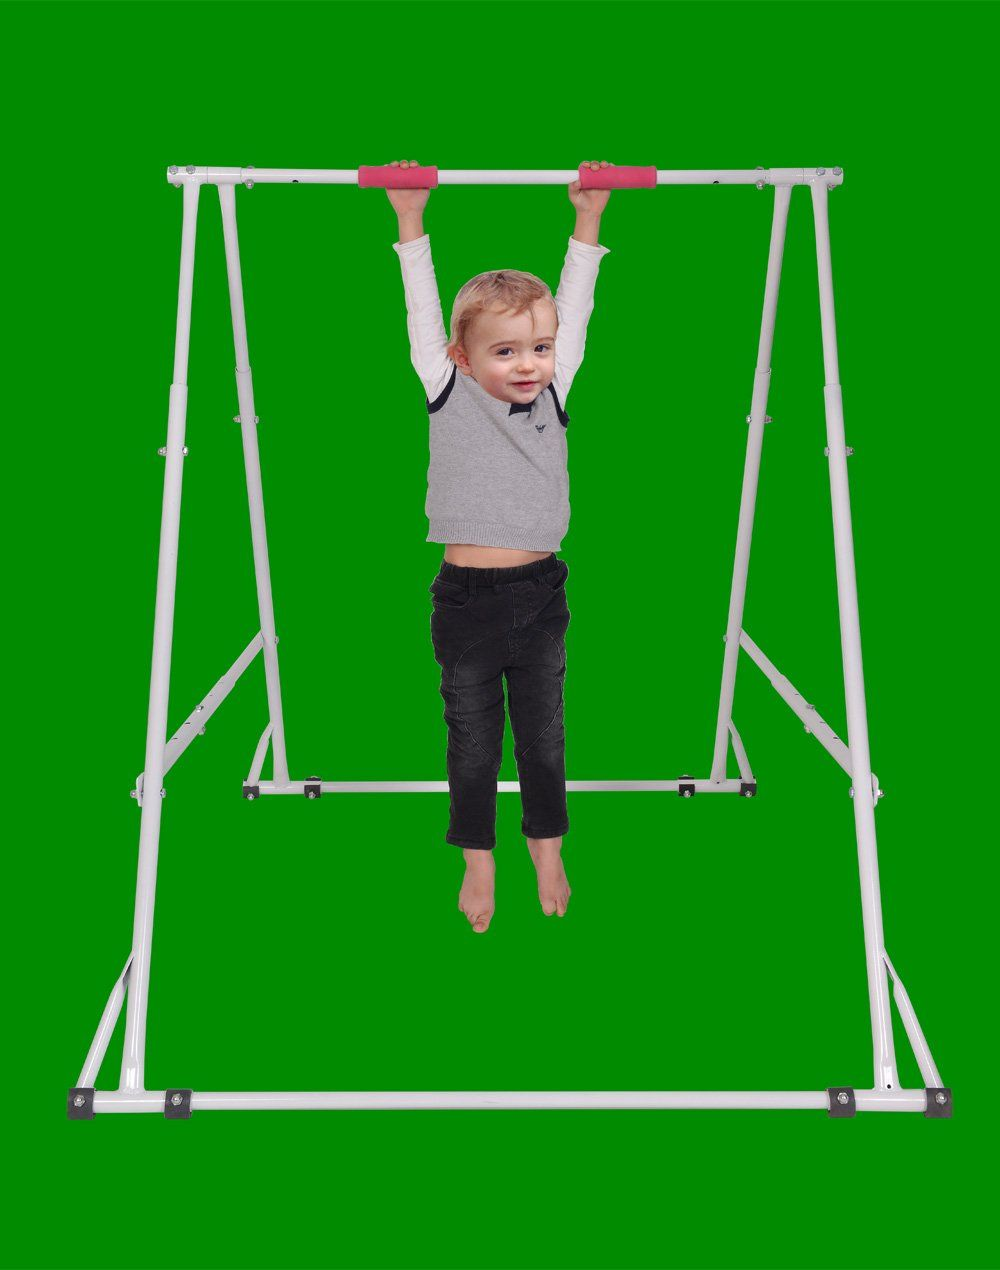 Home Workout Gymnastics Bar For Kids Height Adjustable Chin Up Bar